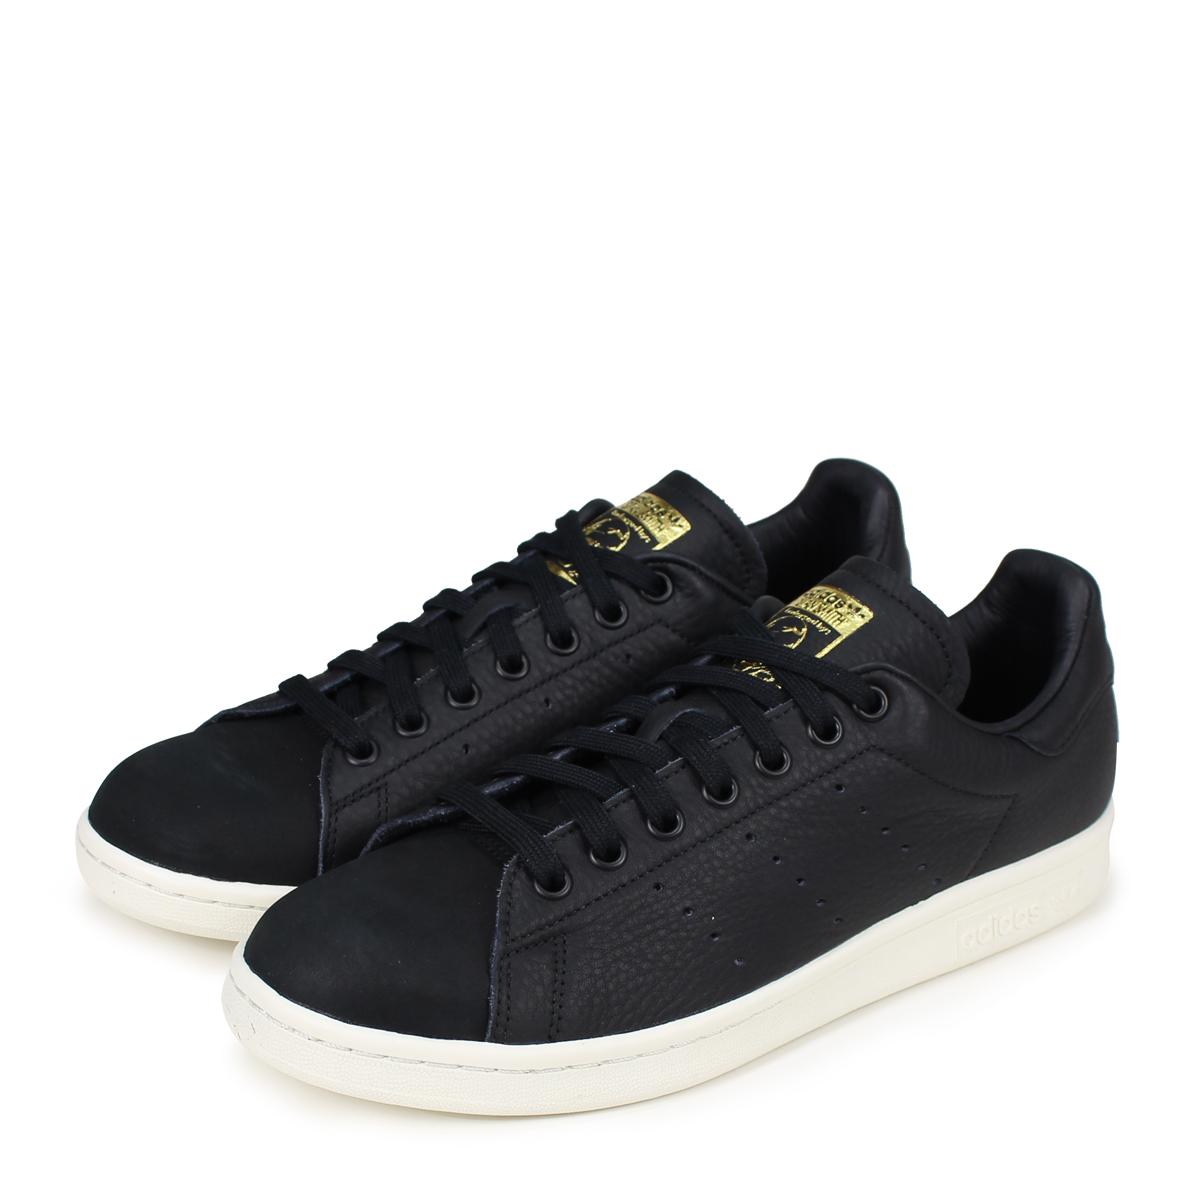 best service 6ca46 d49ea adidas Originals STAN SMITH PREMIUM Adidas originals Stan Smith sneakers  men gap Dis B37901 black [load planned Shinnyu load in reservation product  ...